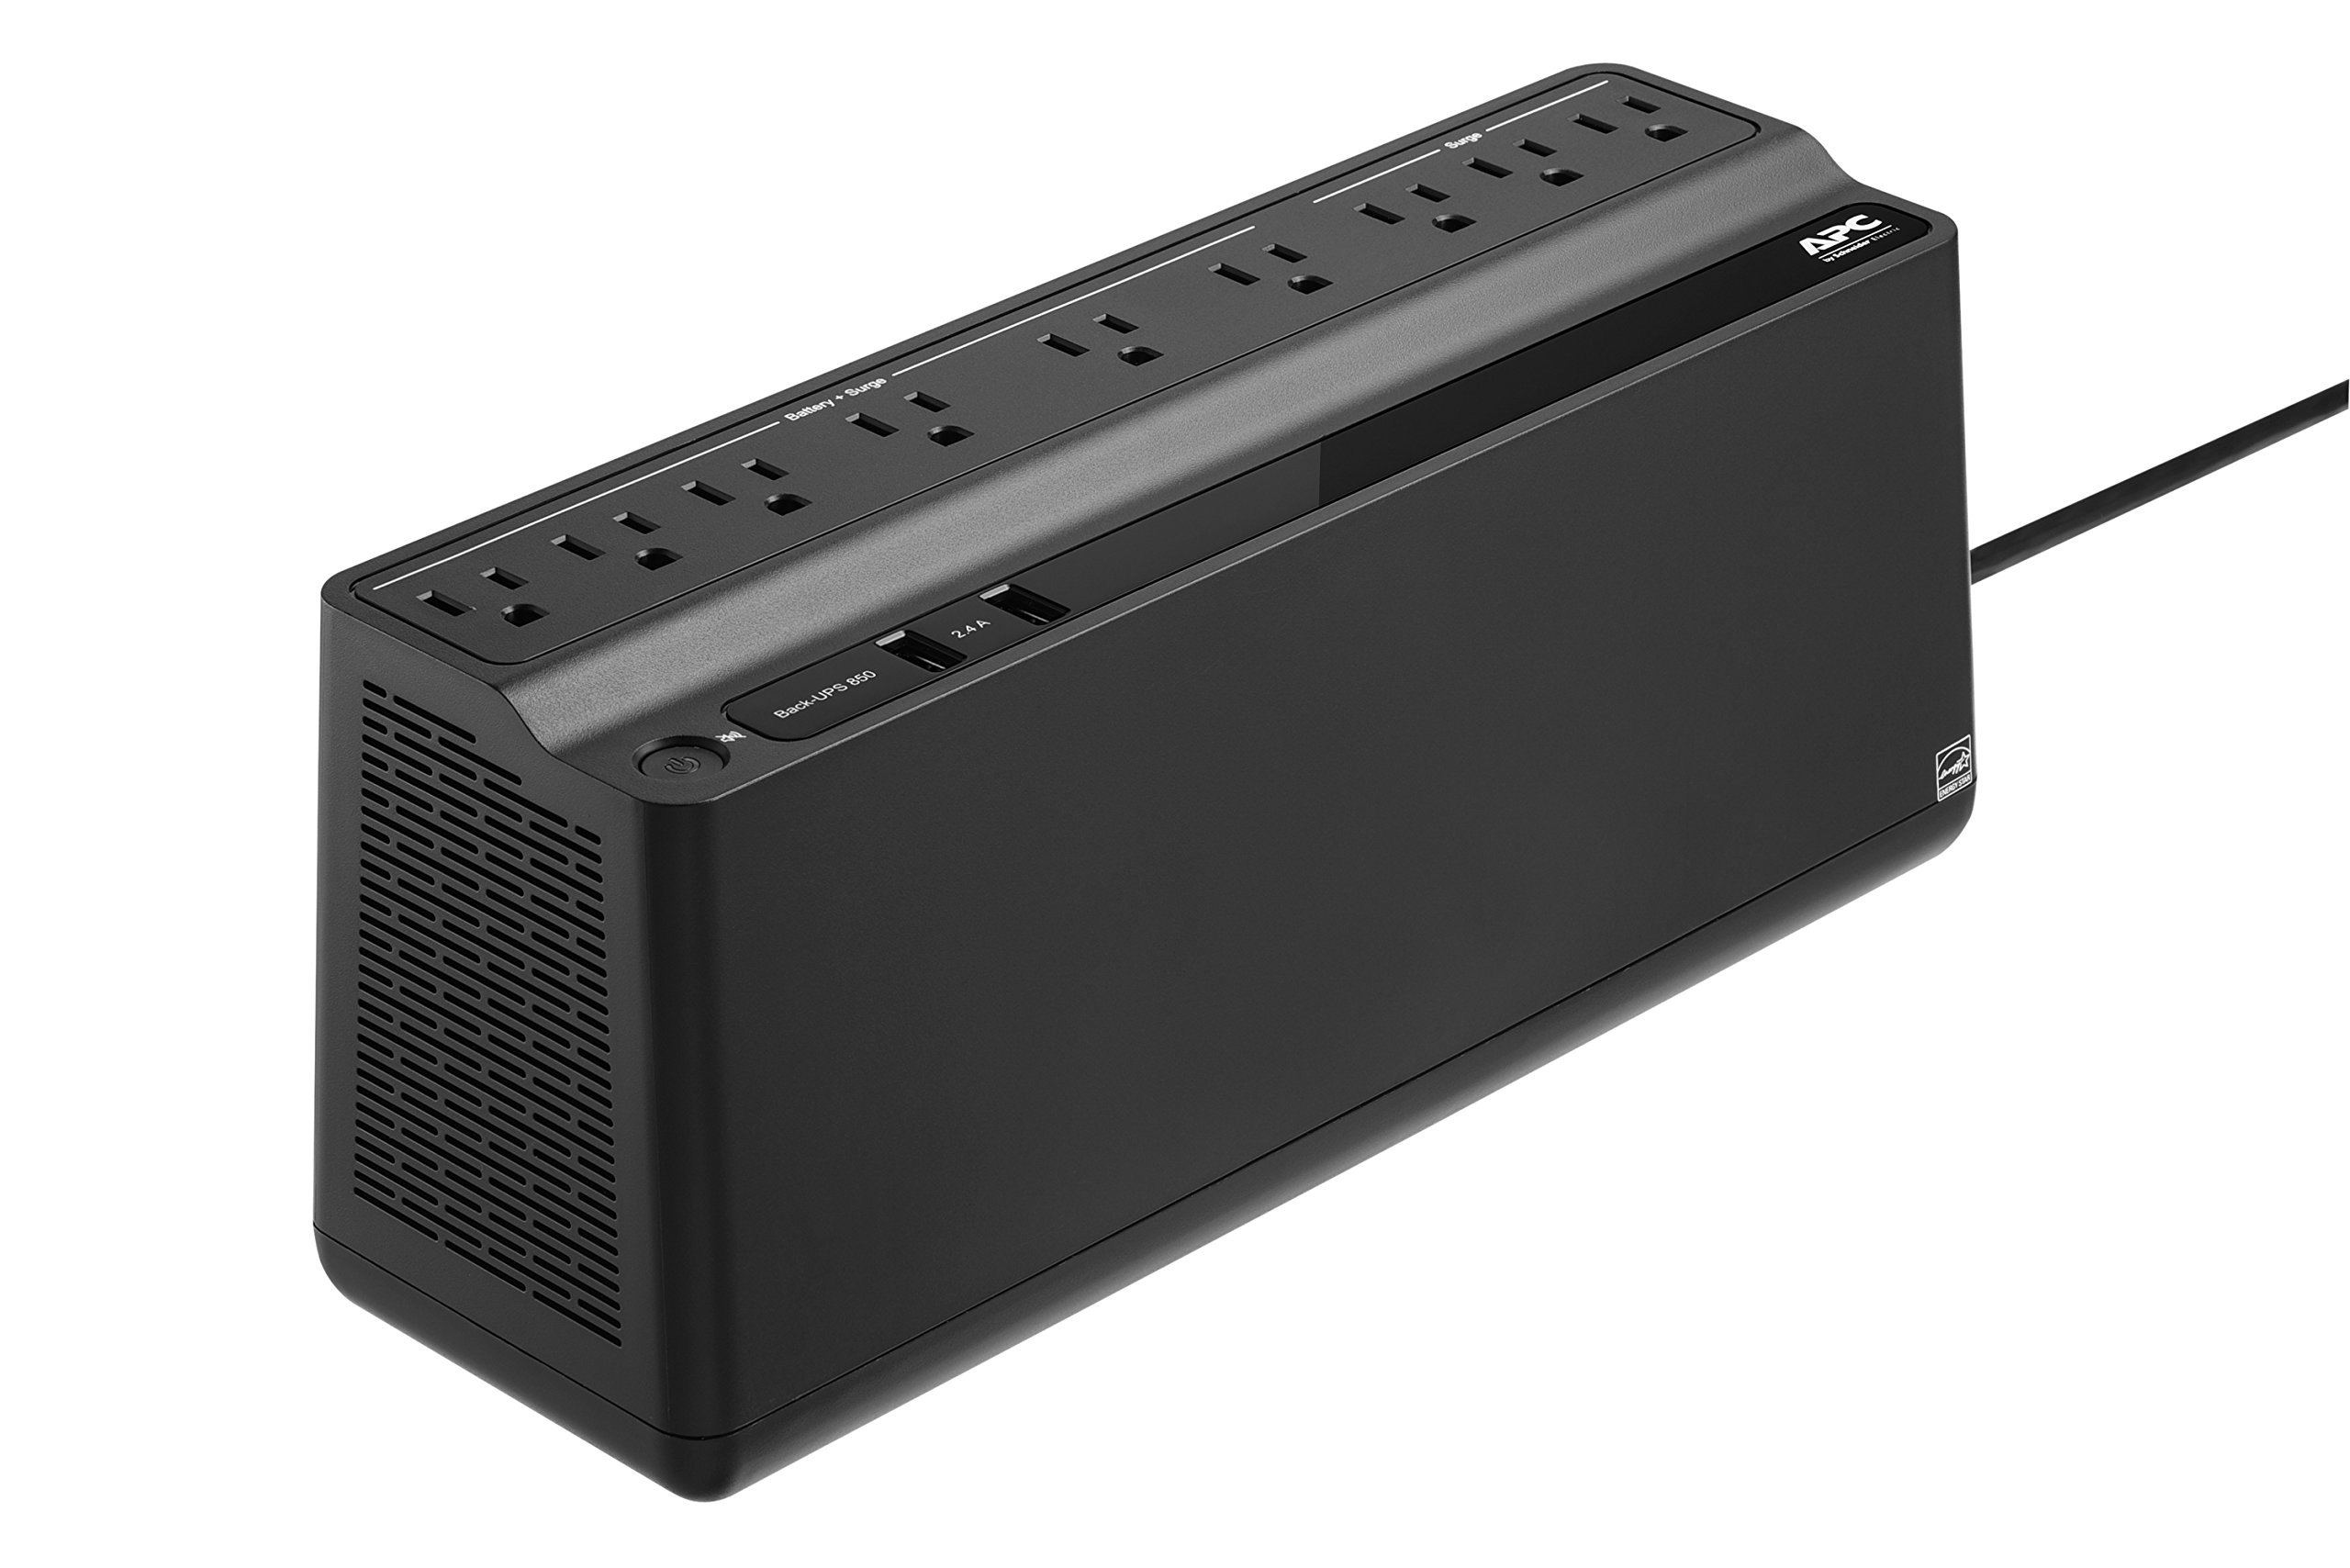 APC Back-UPS 850VA UPS Battery Backup & Surge Protector with USB Charging Ports (BE850M2) by APC